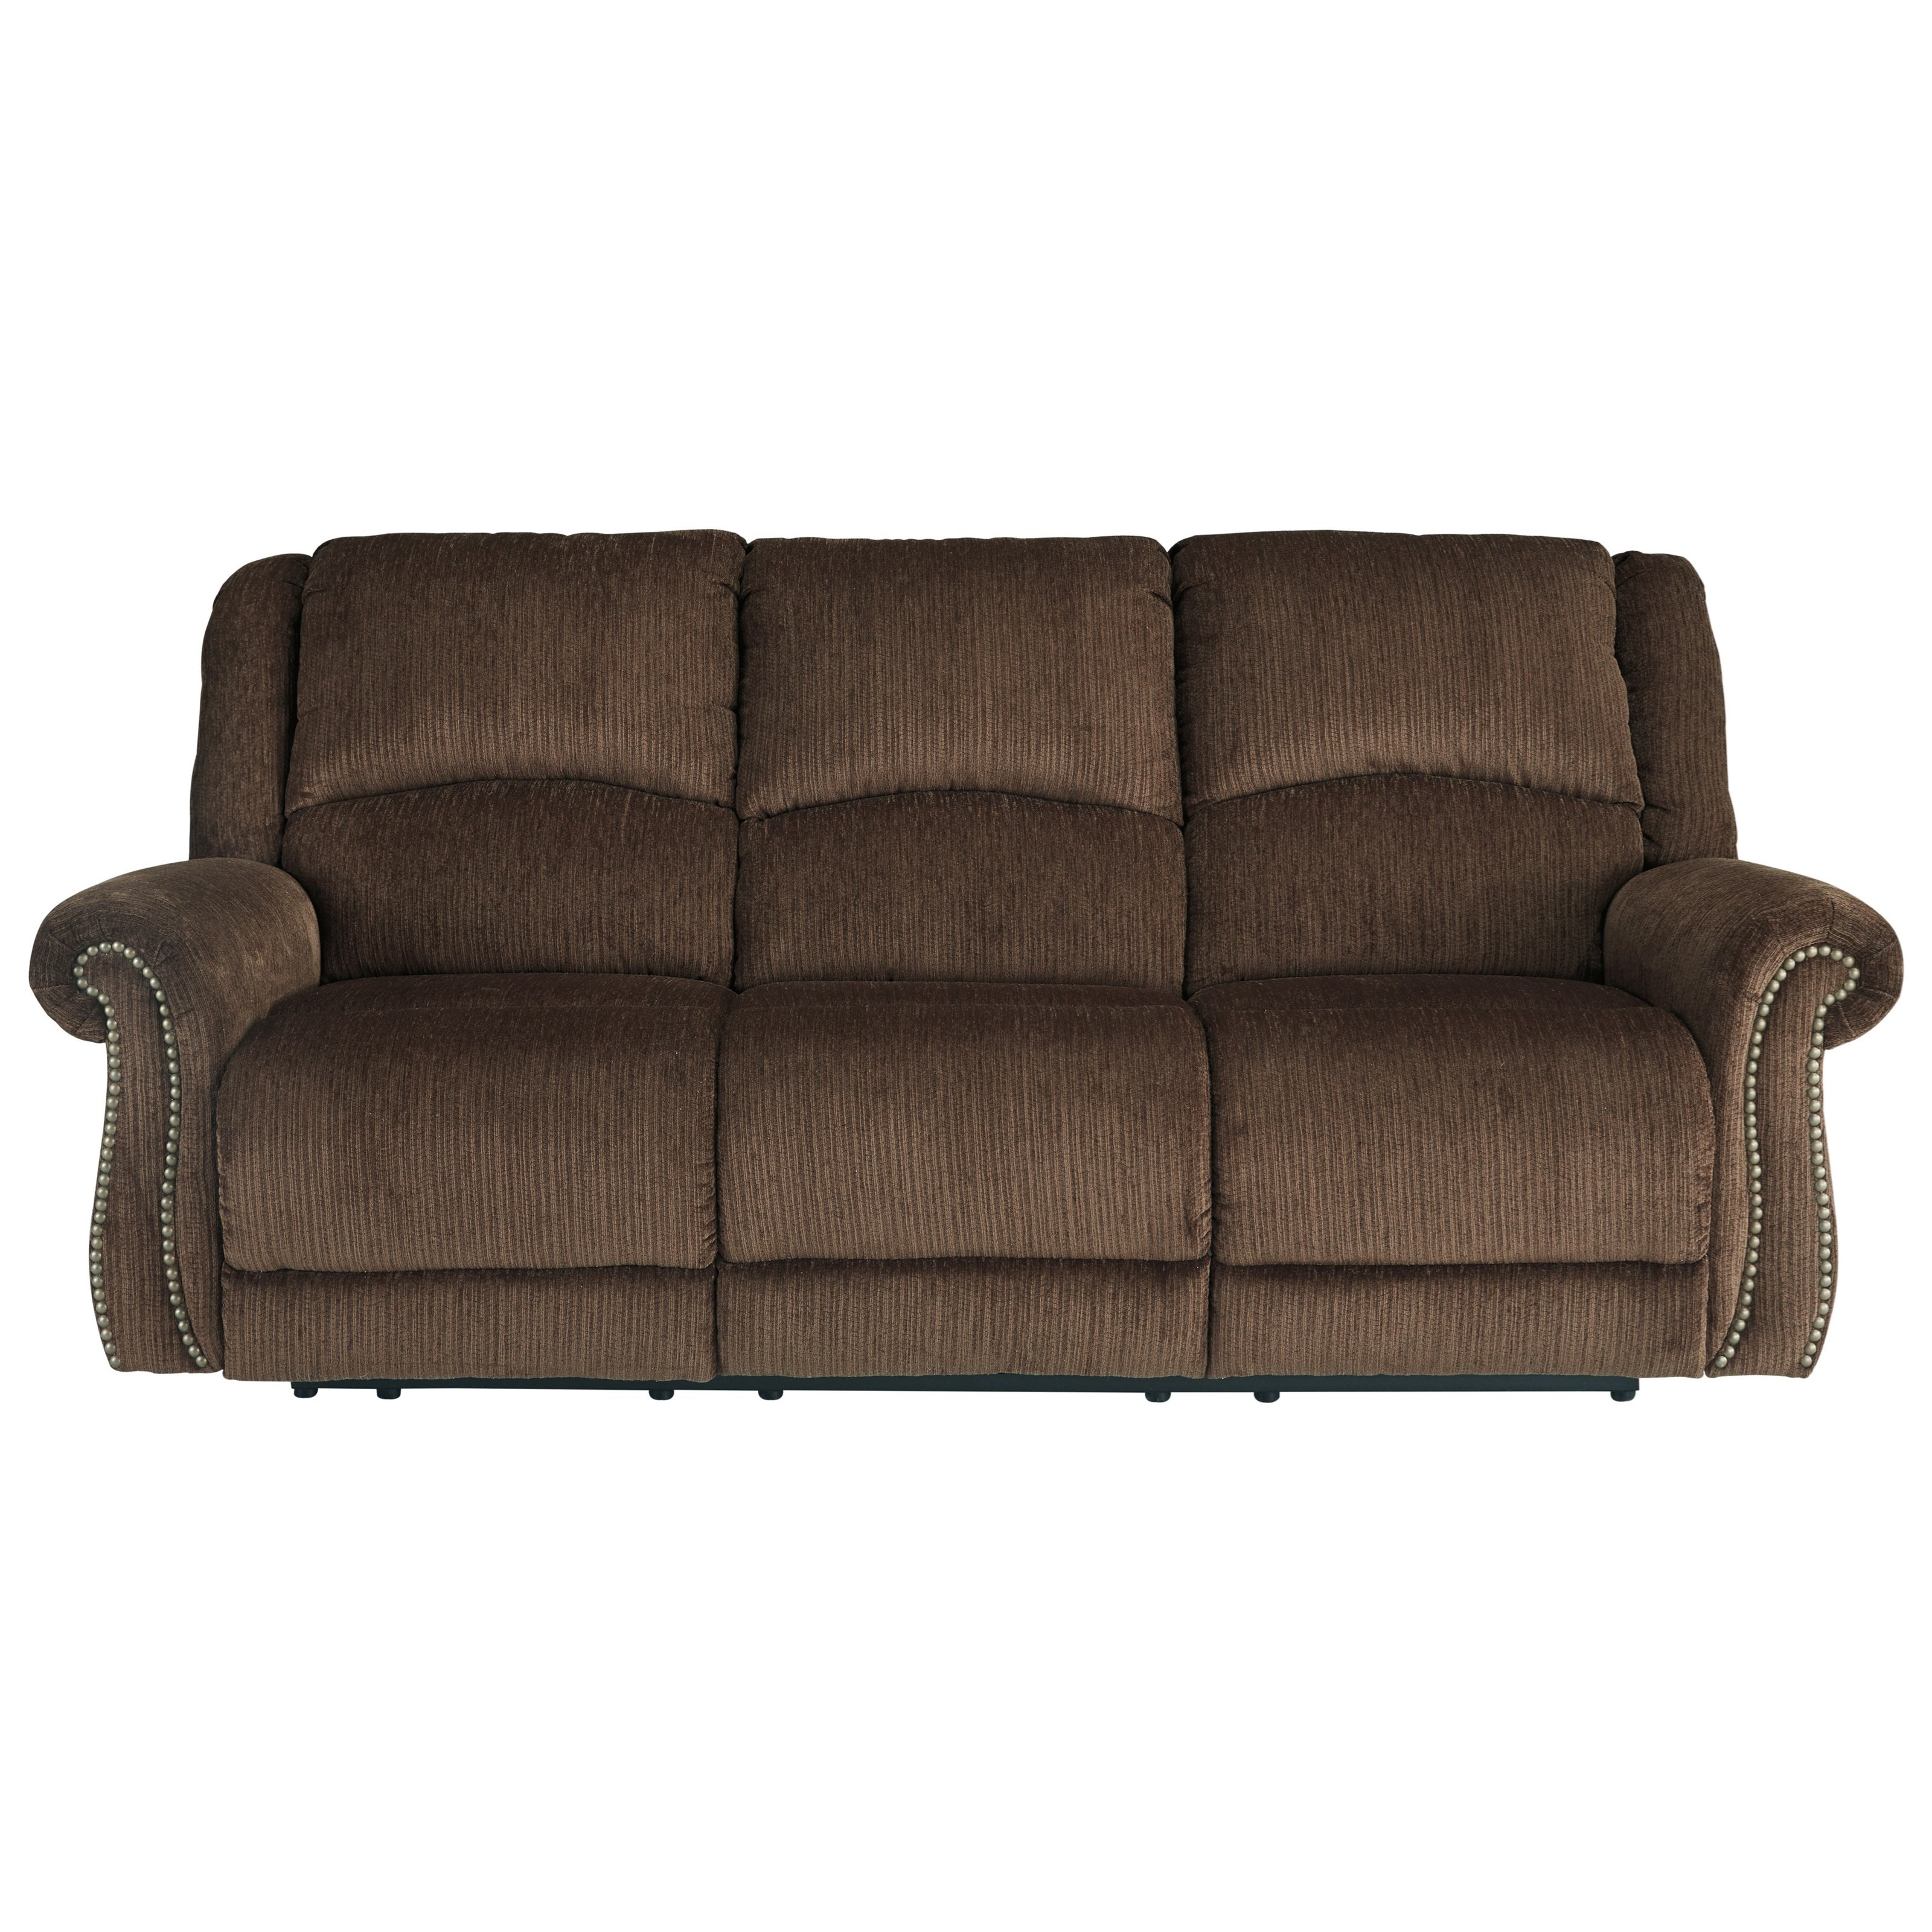 Marvelous Goodlow Power Reclining Sofa W Adjustable Headrests Short Links Chair Design For Home Short Linksinfo